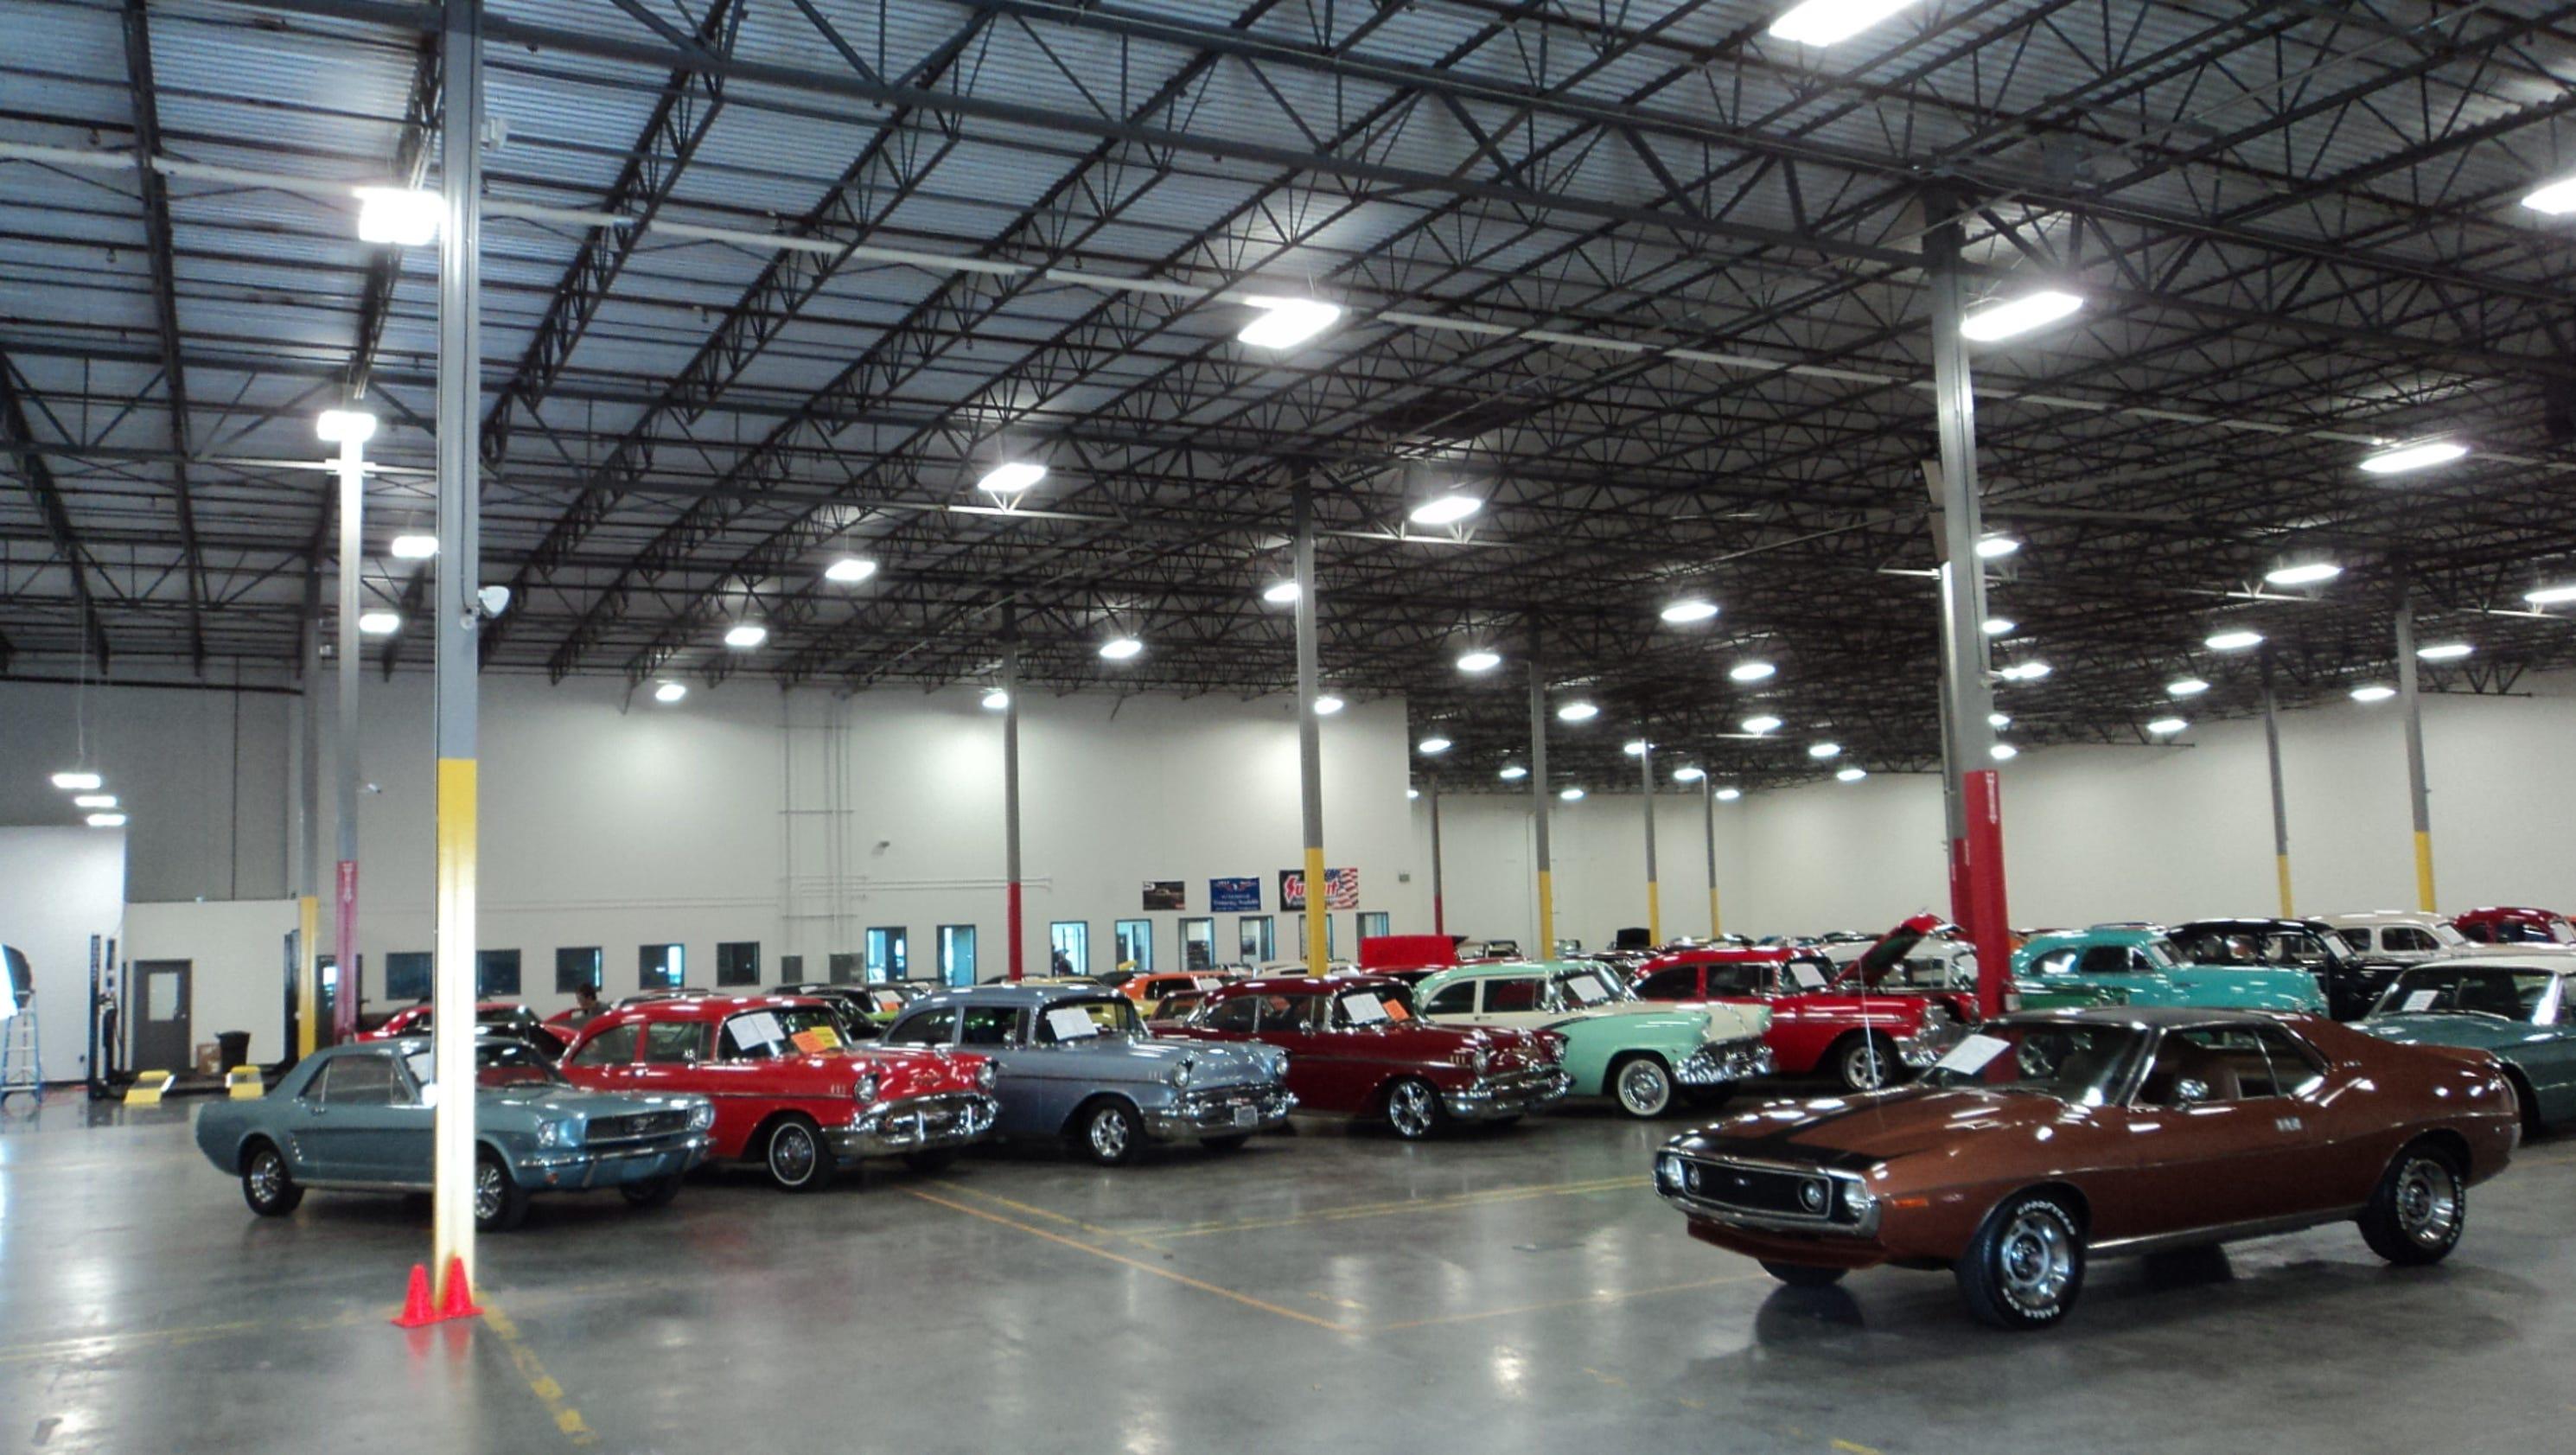 Classic cars showroom plans April opening in La Vergne